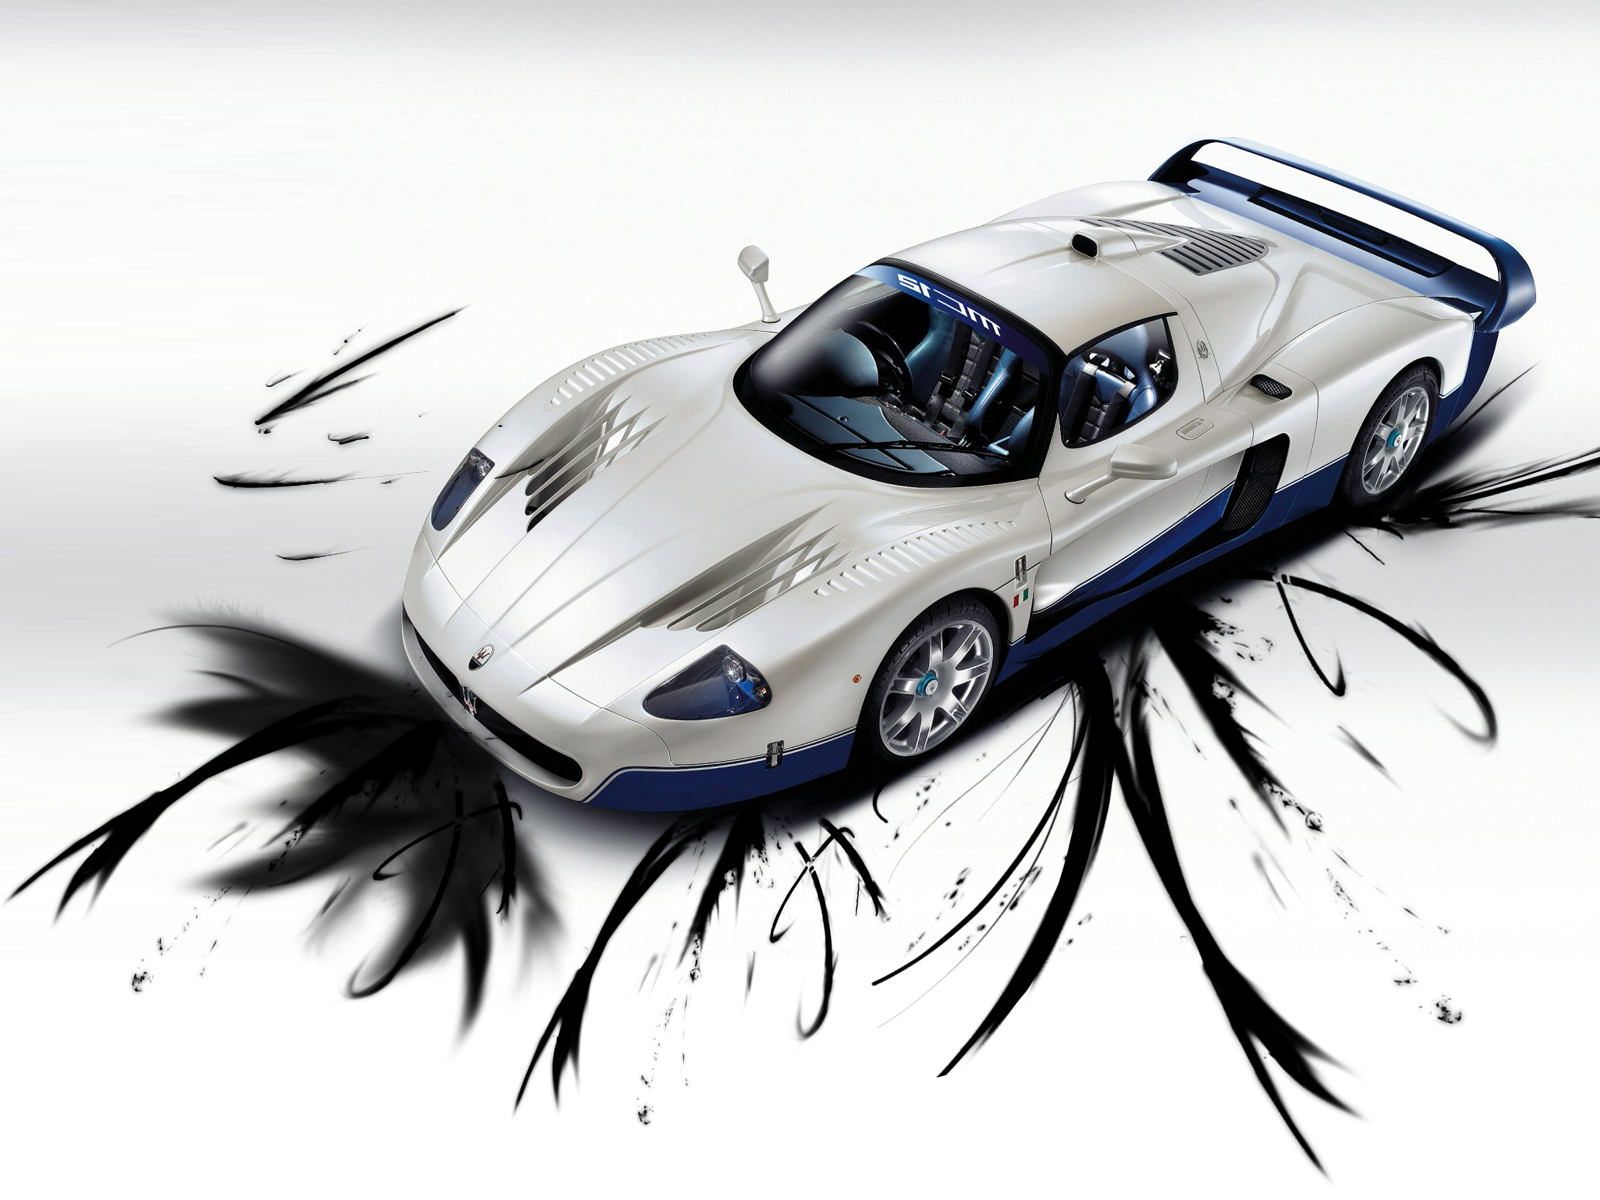 Sports car wallpaper for desktop Its My Car Club 1600x1200